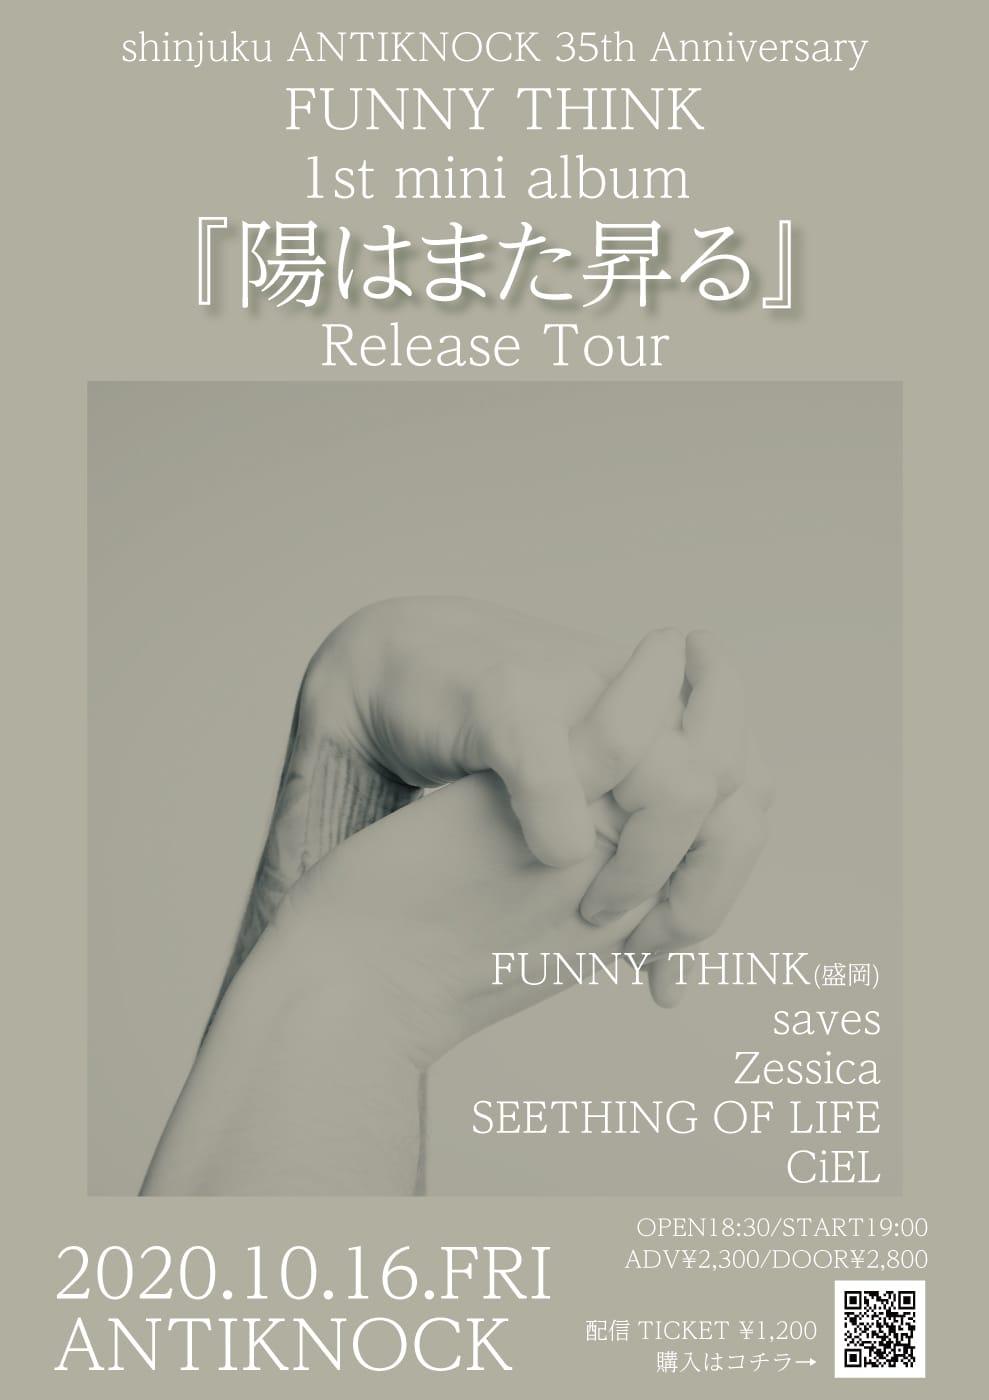 【FUNNY THINK 1st mini album 『陽はまた昇る』 Release Tour】